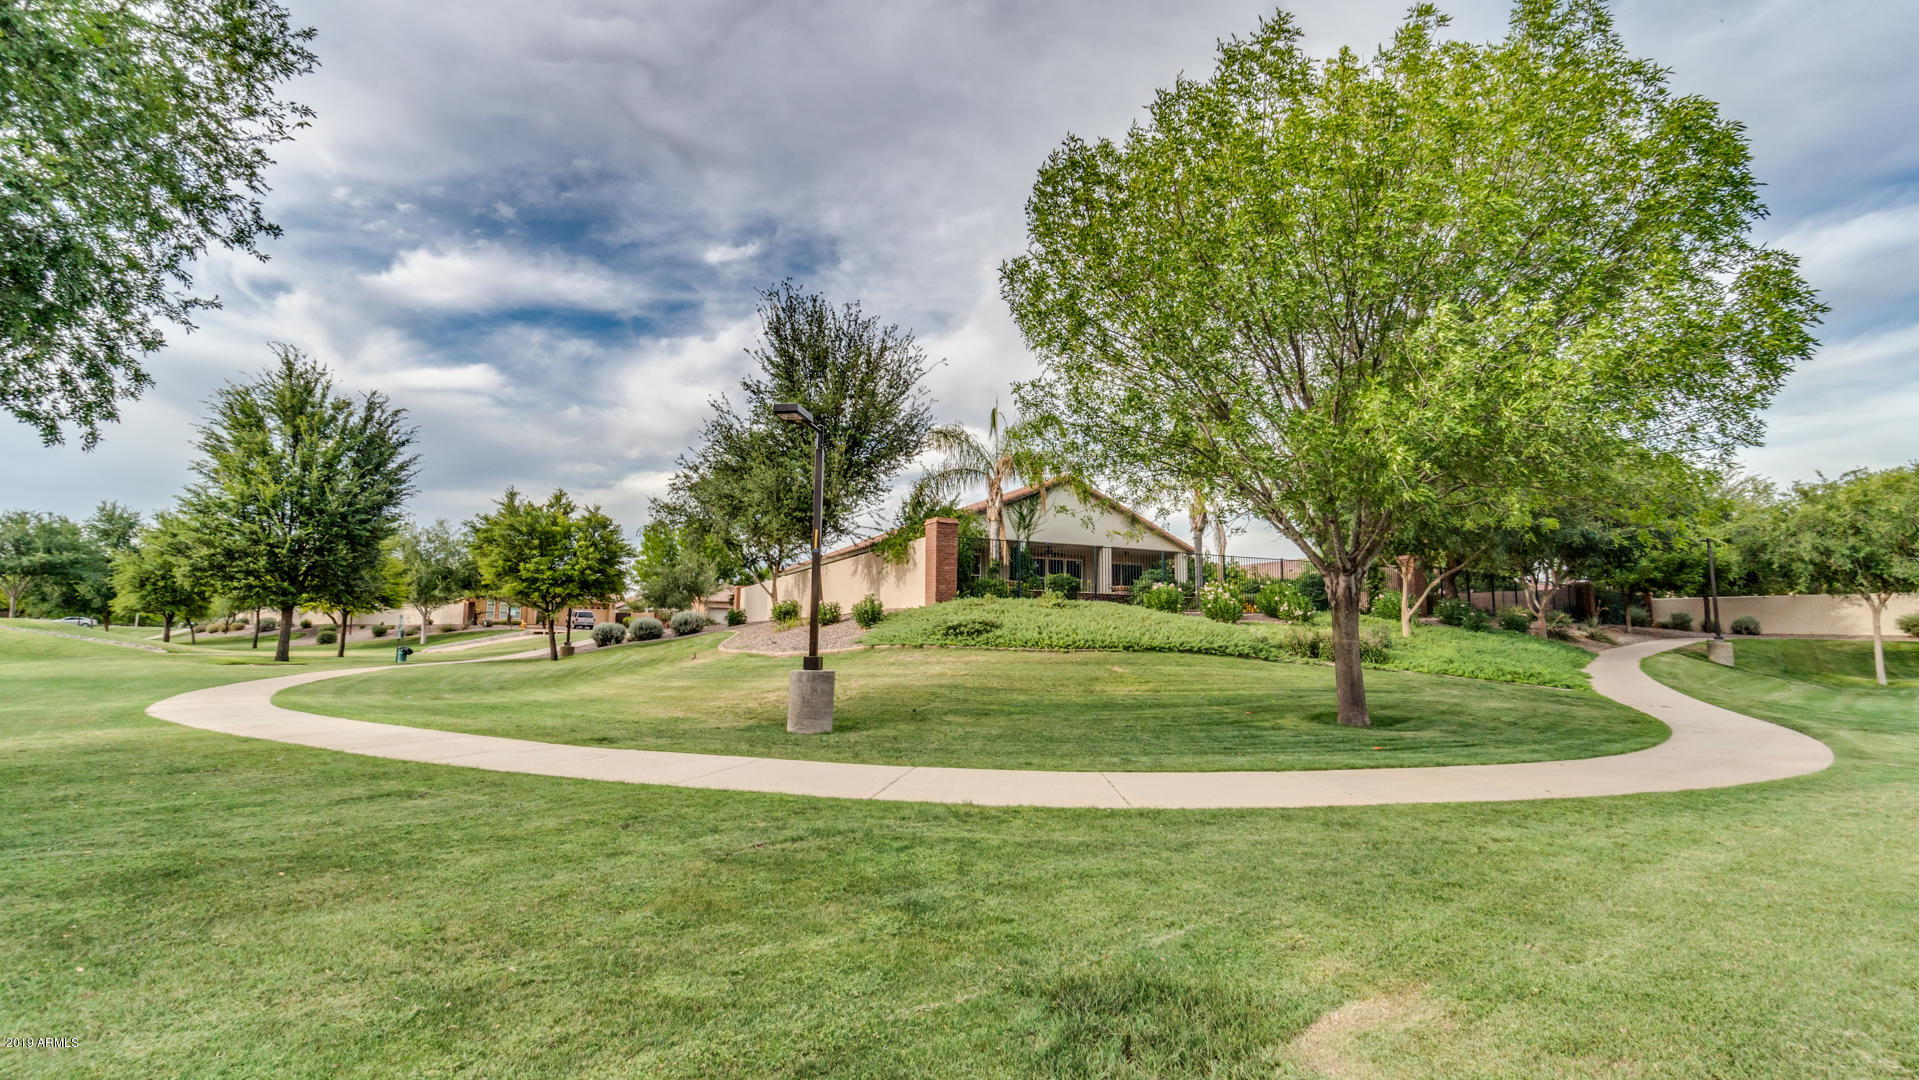 MLS 5946500 2316 E BALSAM Drive, Chandler, AZ 85286 Chandler AZ Markwood North